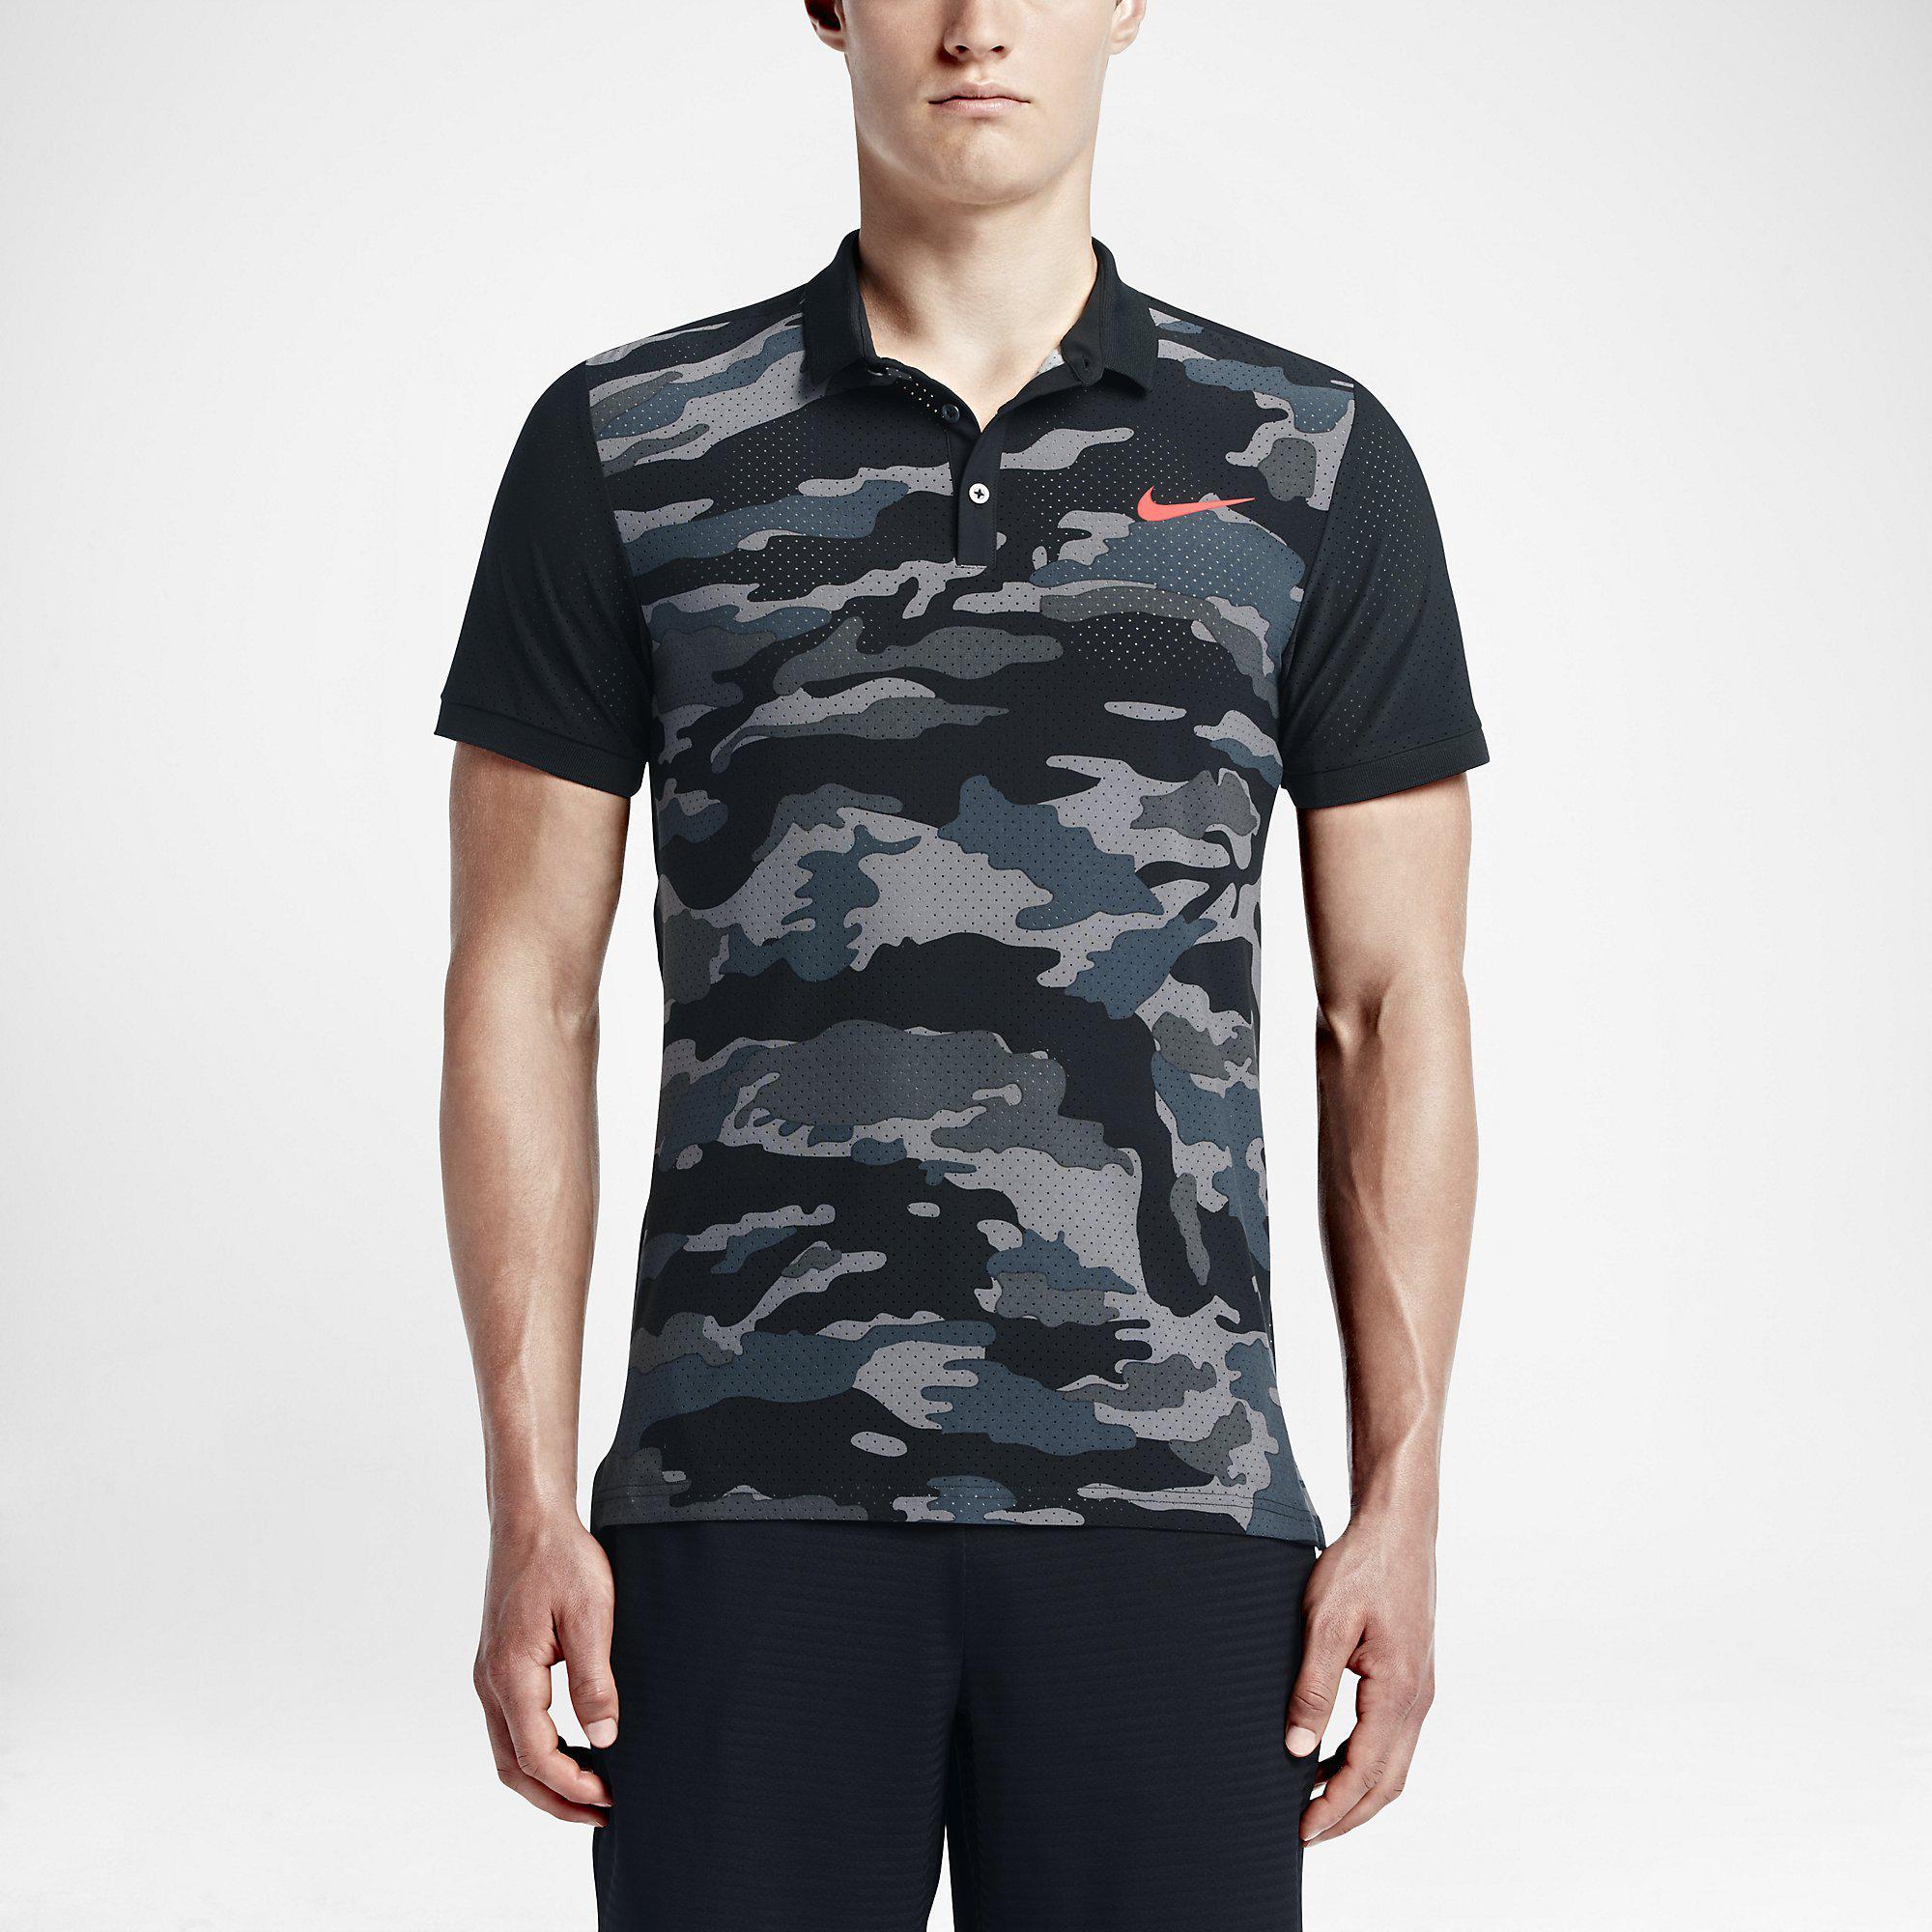 nike camouflage tennis shirt